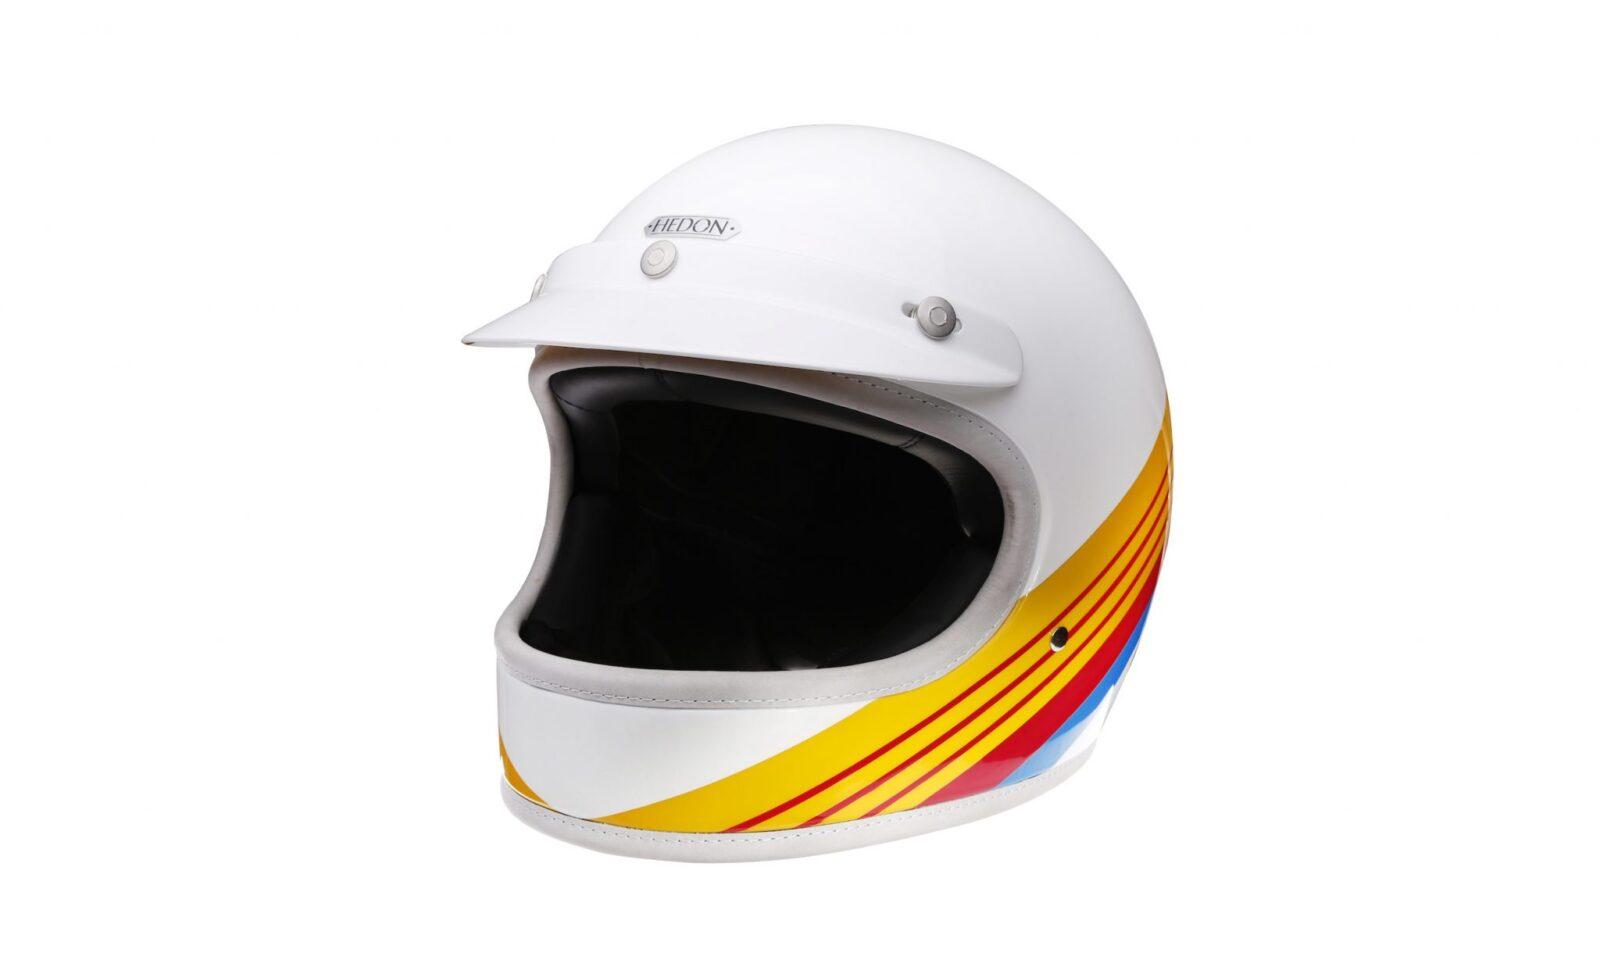 HEDON X DIRTQUAKE 3.4 1600x977 - Hedon Heroine Dirt Quake Trailblazer Helmet